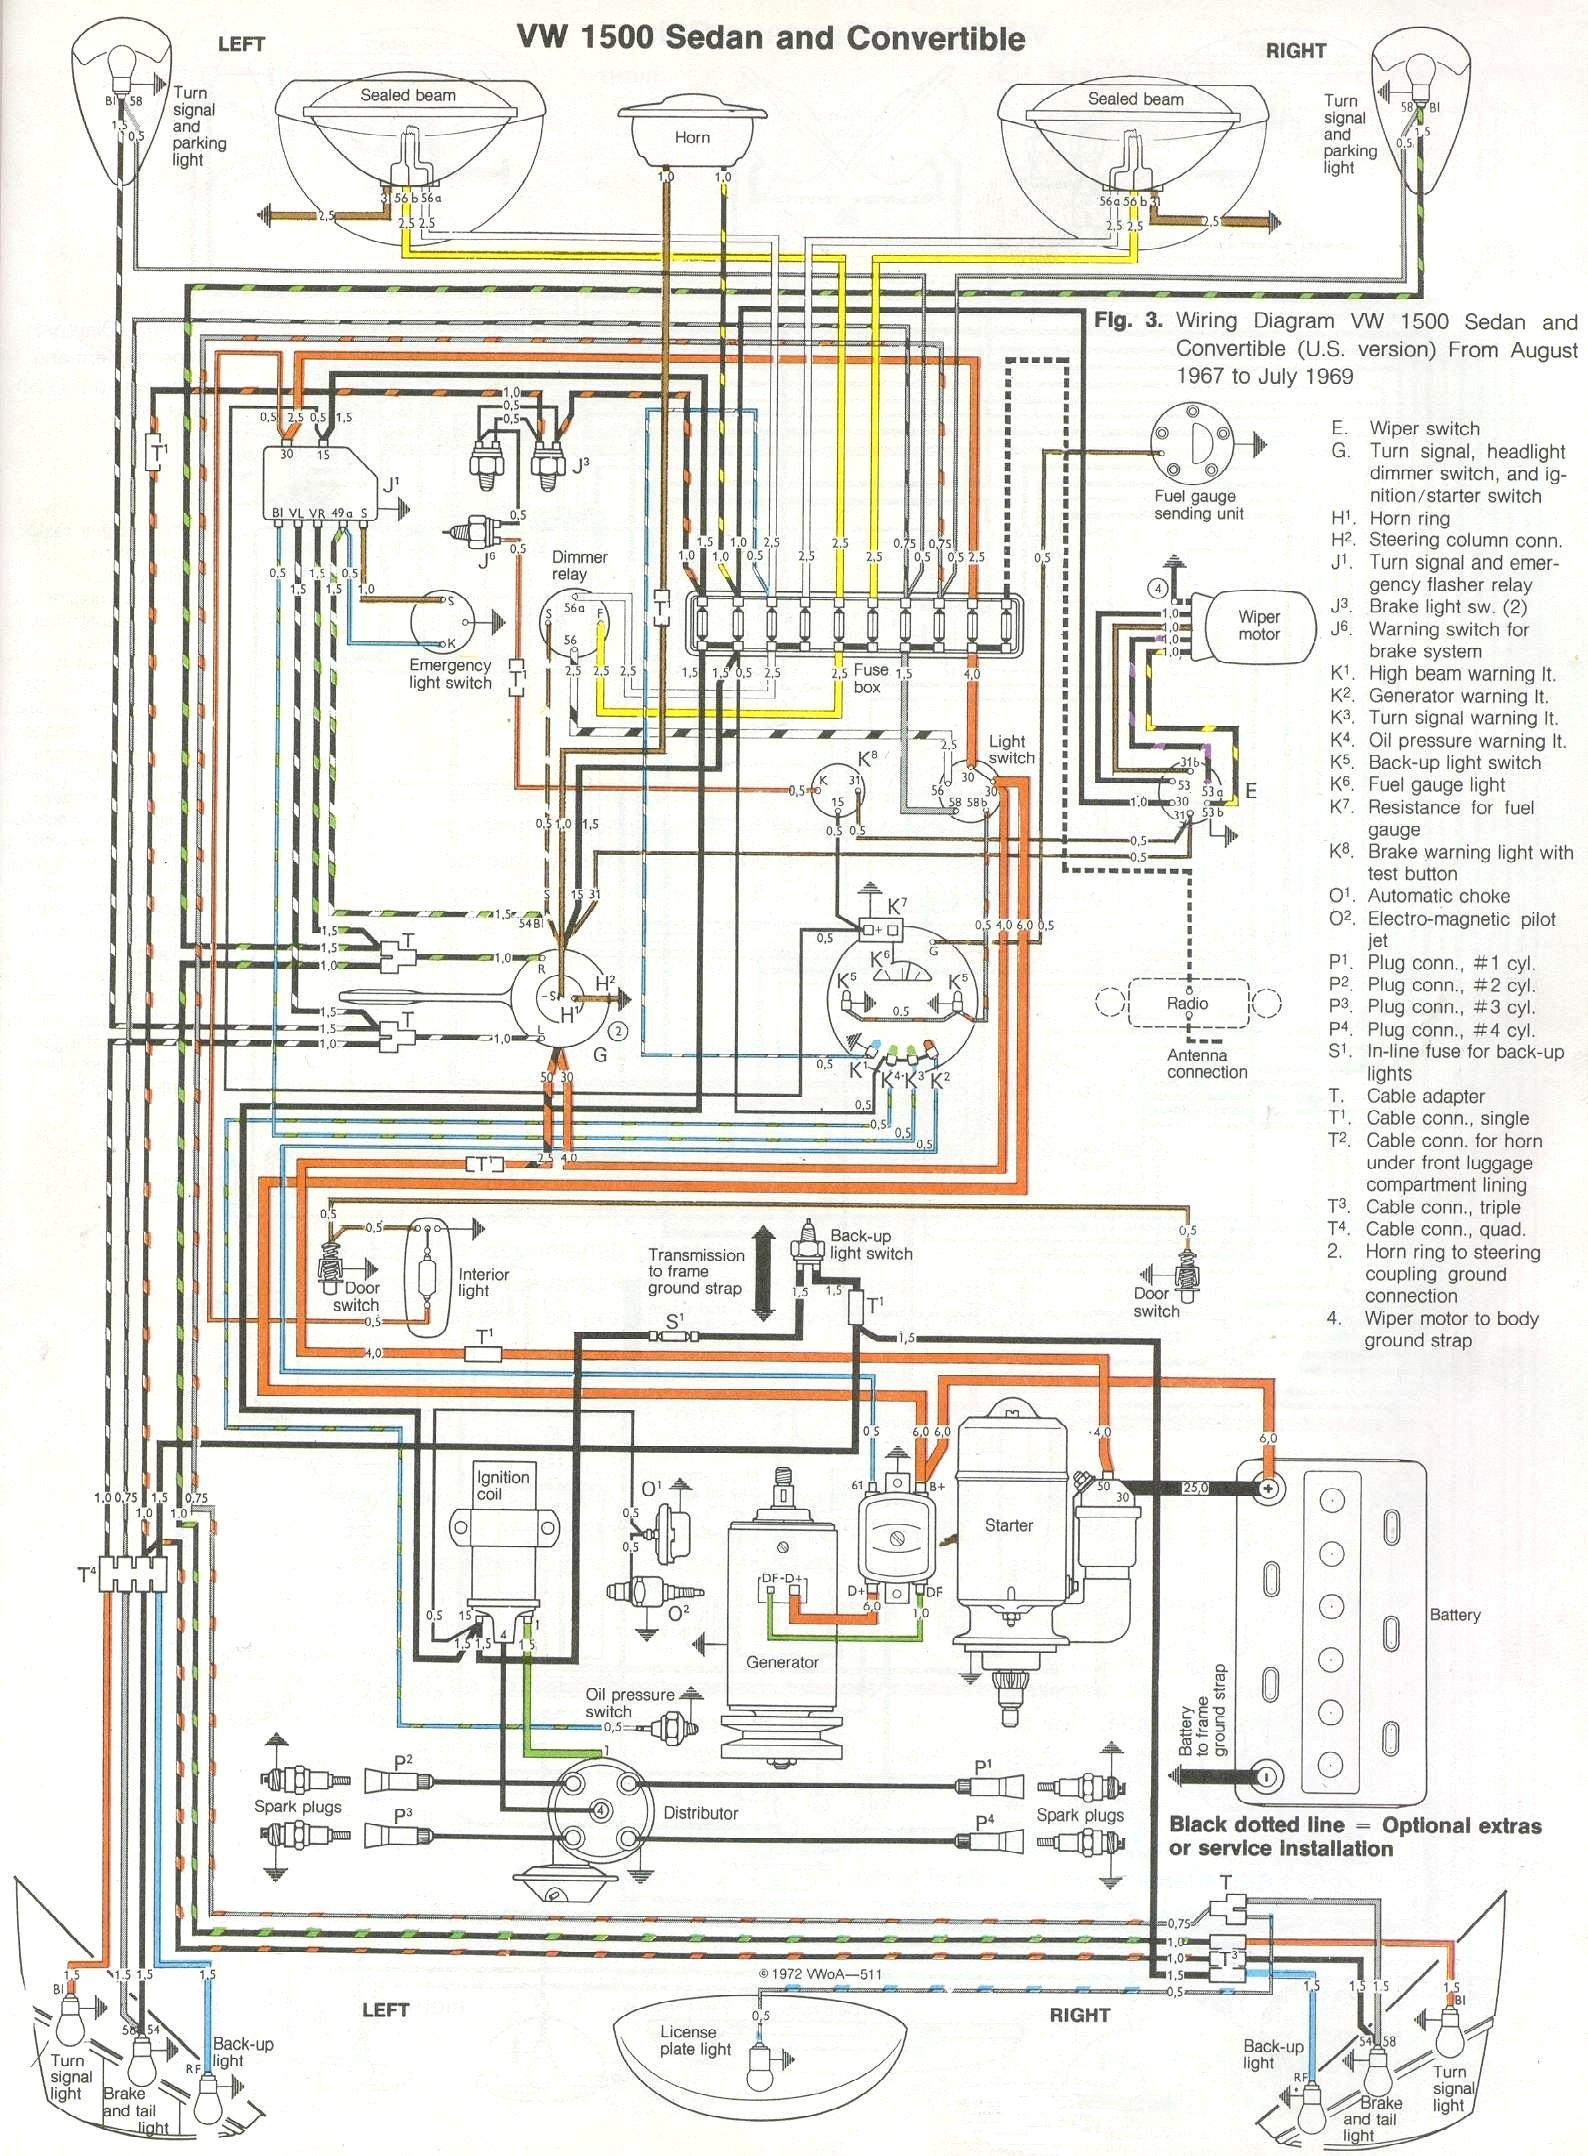 [QMVU_8575]  DE356A 2003 Vw Beetle Fuse Block Wiring Harness | Wiring Library | Vw Beetle Wiring Harness |  | Wiring Library